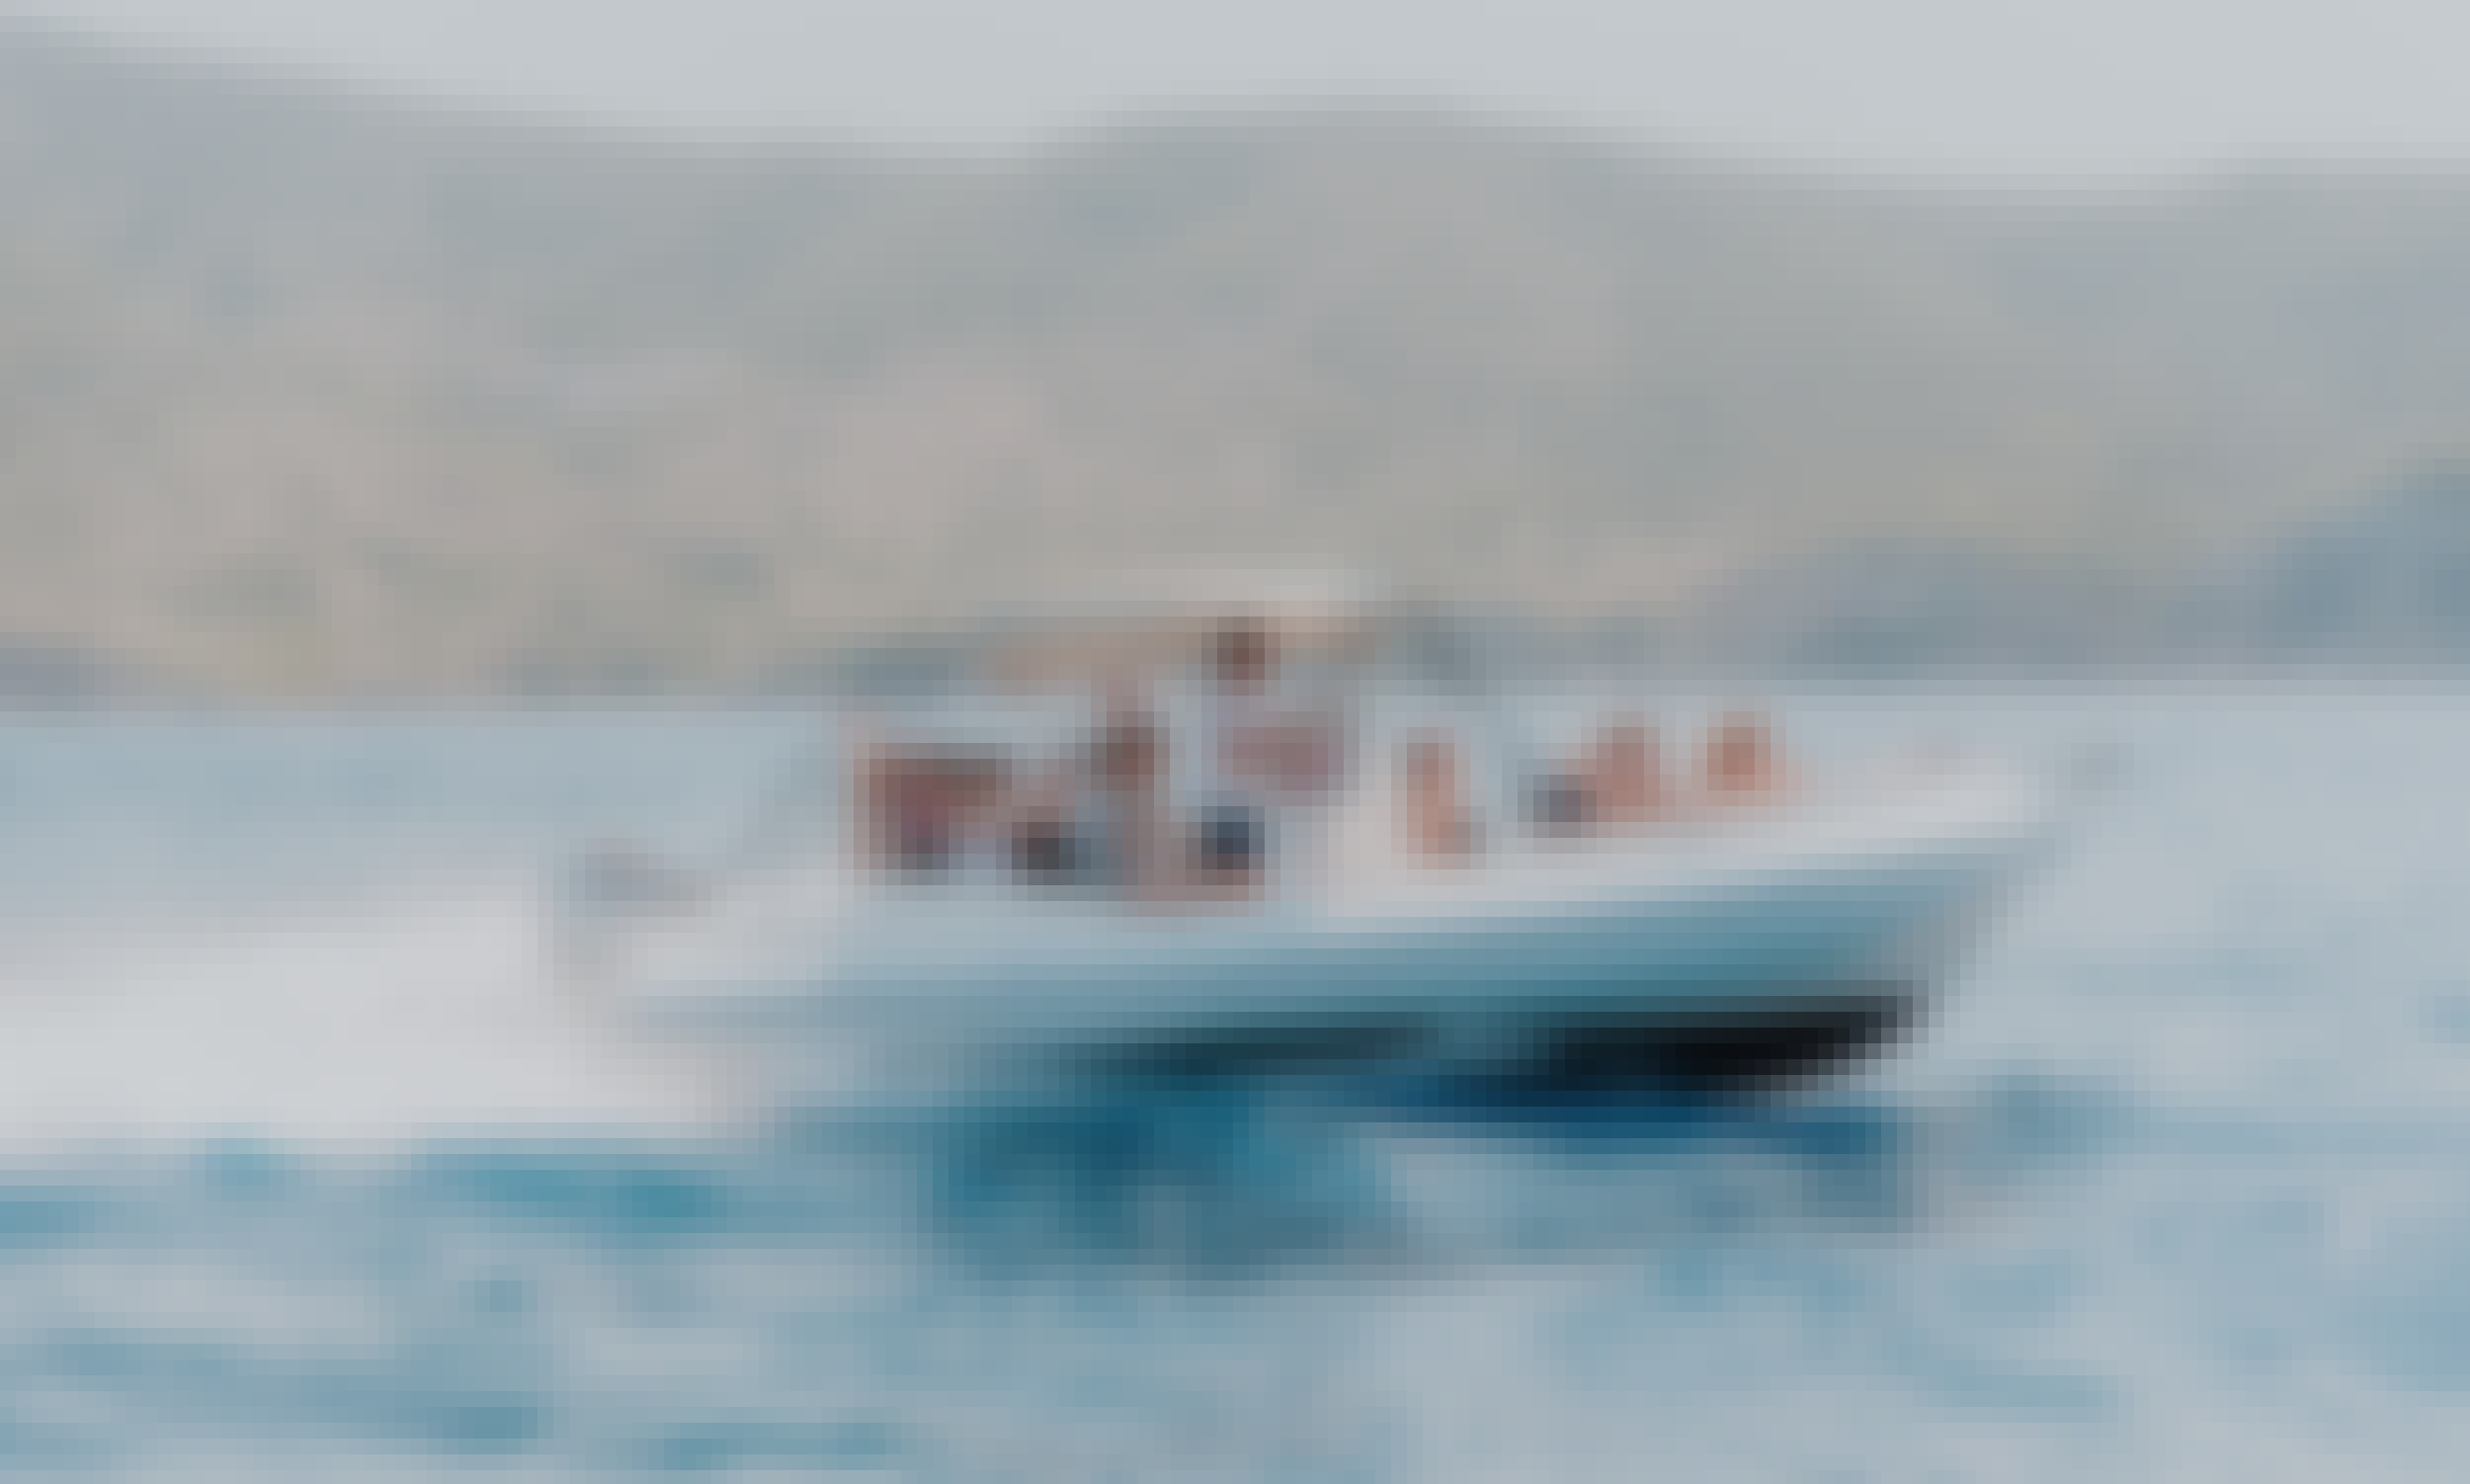 Scanner 710 Envy Tender Inflatable Boat for Rent in Split, Croatia